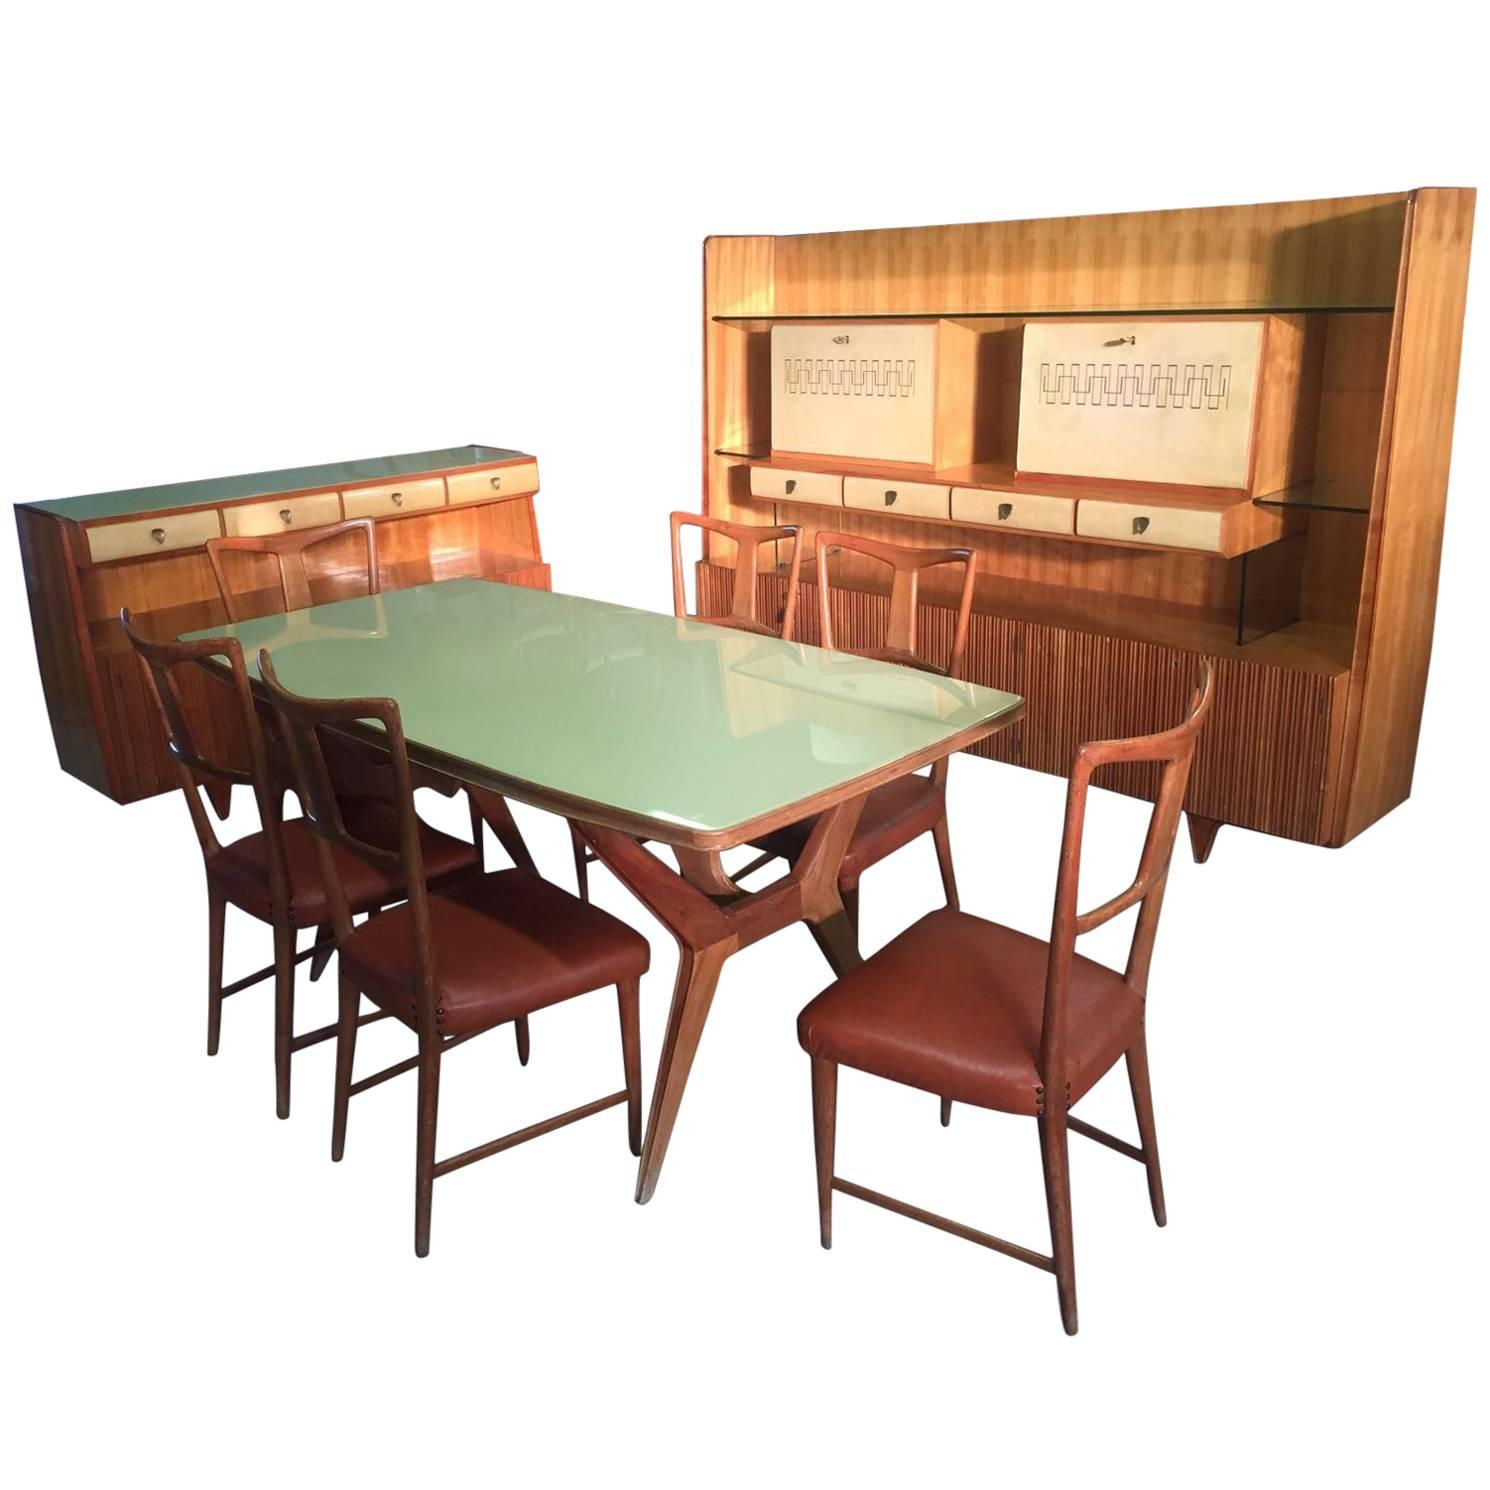 Italian Dining Room Sets By U0027La Permanente Mobili Cantuu0027 Attributed To Gio  Ponti